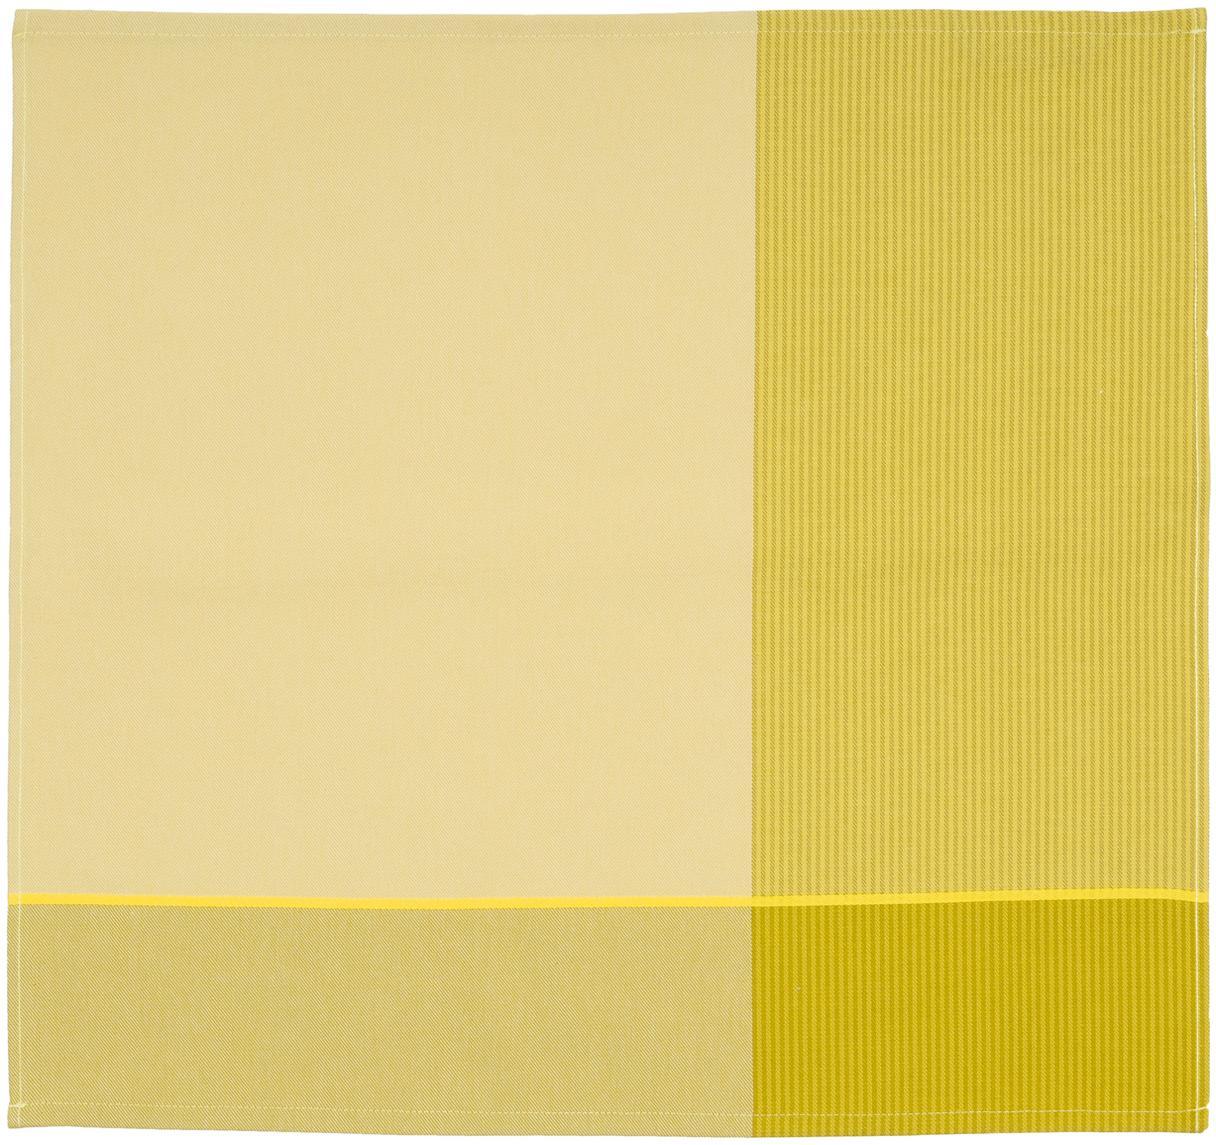 Paños de cocina Blend, 6uds., Algodón, Amarillo, An 60 x L 65 cm